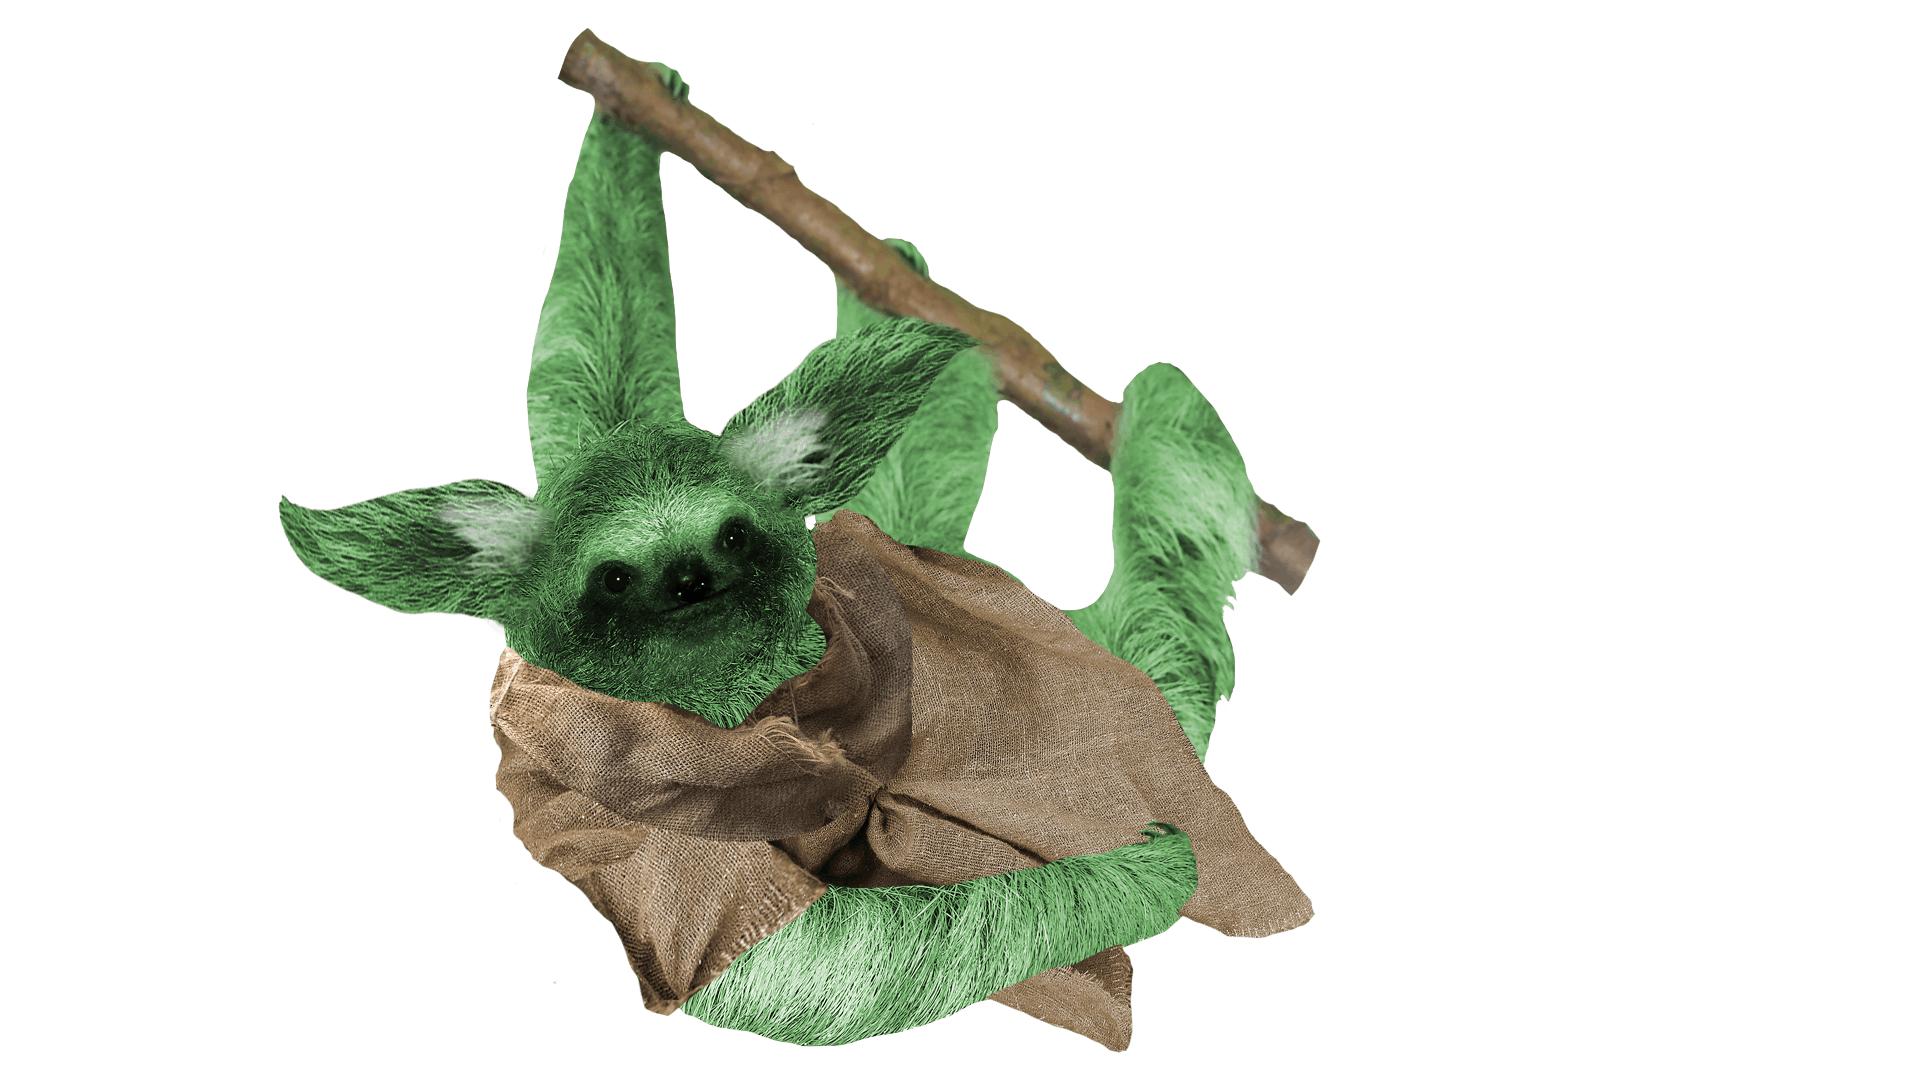 Yoda Sloth